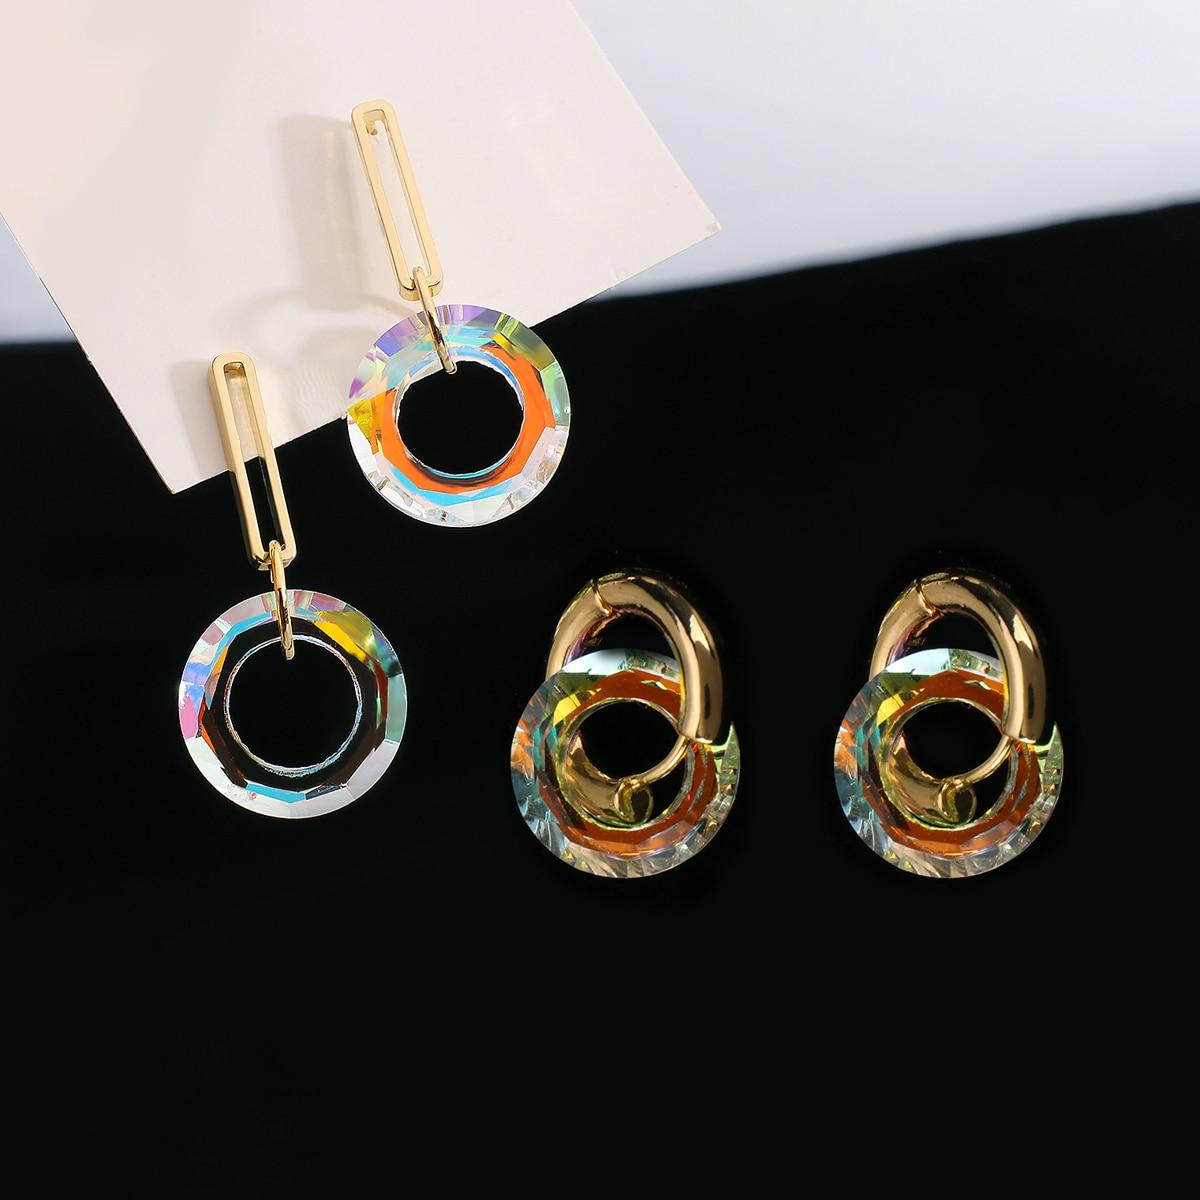 AliExpress - AMORCOME Korean Transparent Colorful Crystal Hoop Earrings for Women Girl Golden Metal Geometric Round Earrings Trendy Jewelry